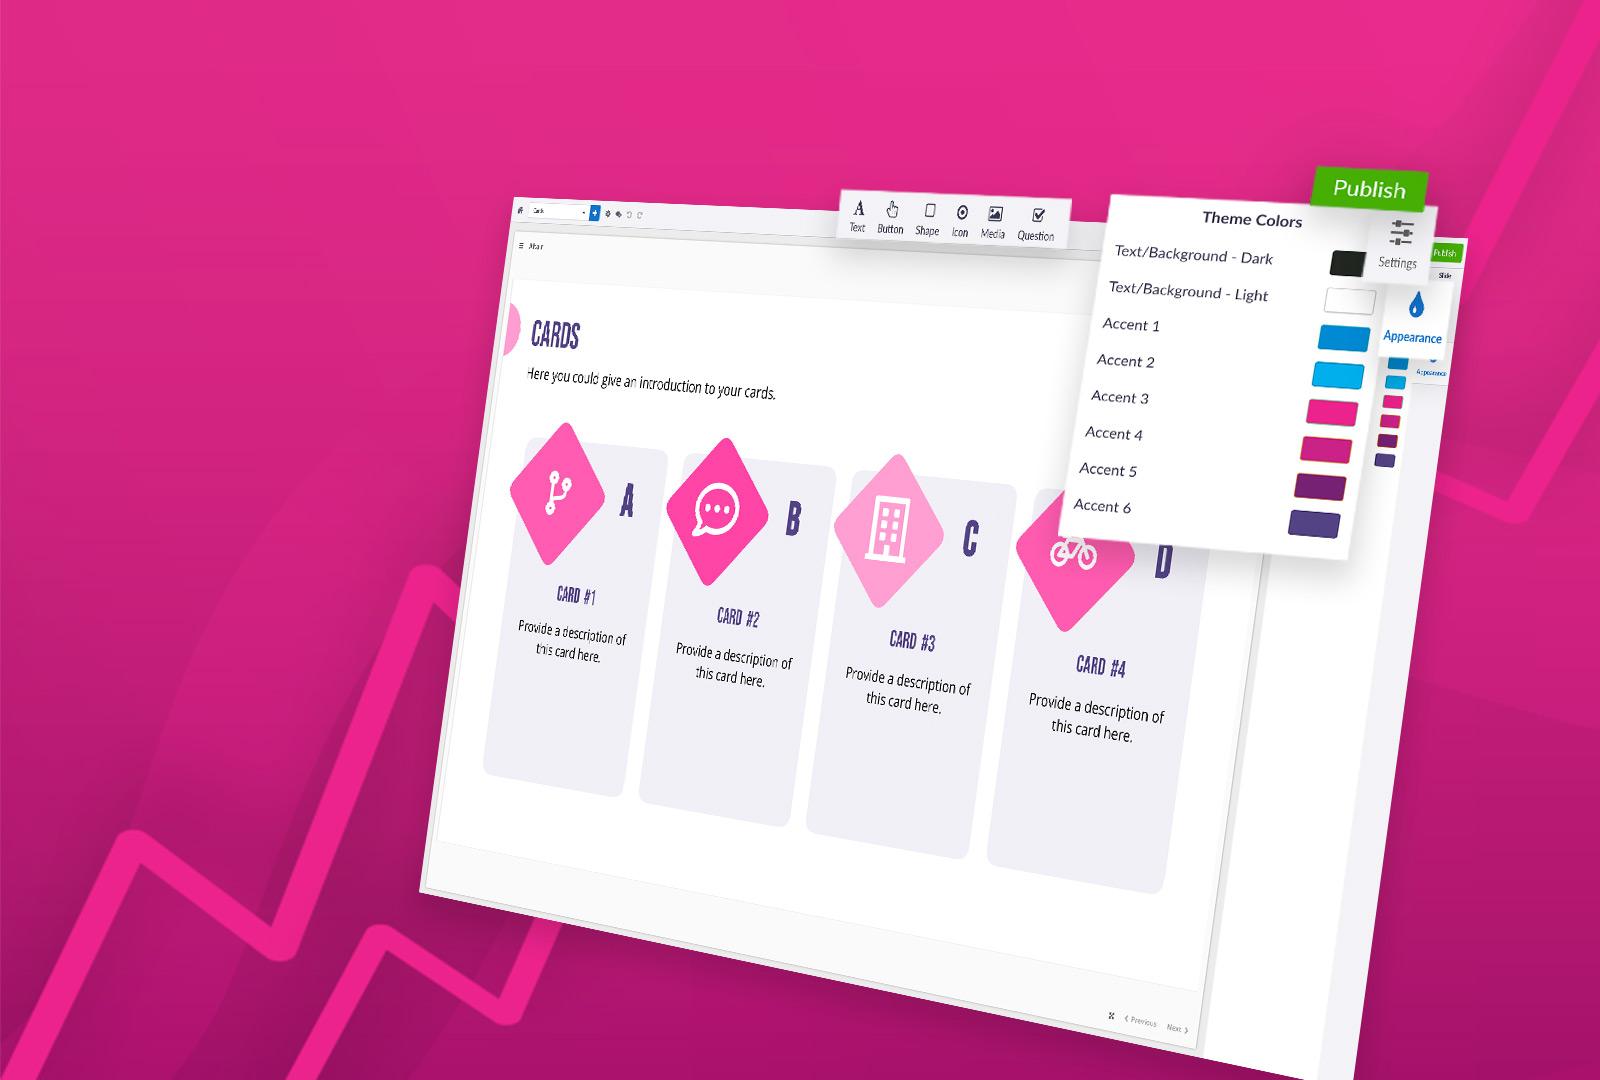 Absorb Create LI: Online Course Builder